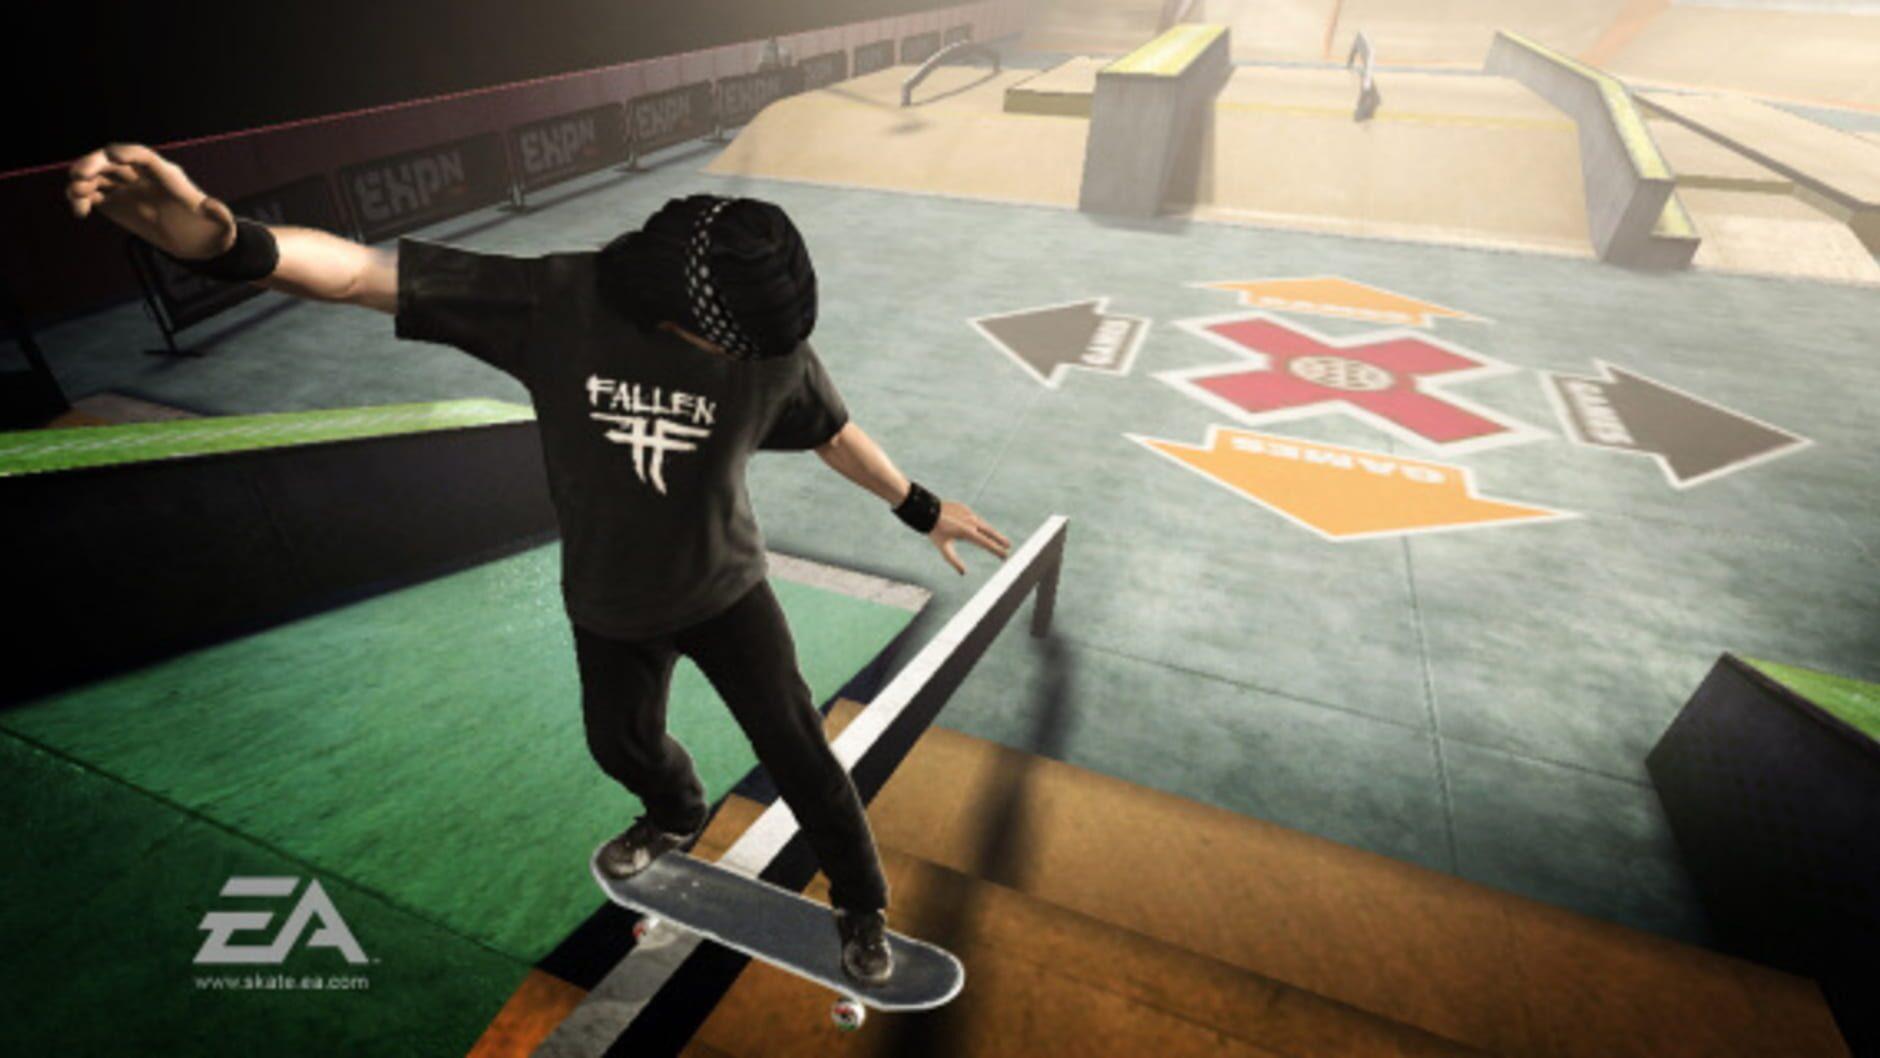 Skate - 0